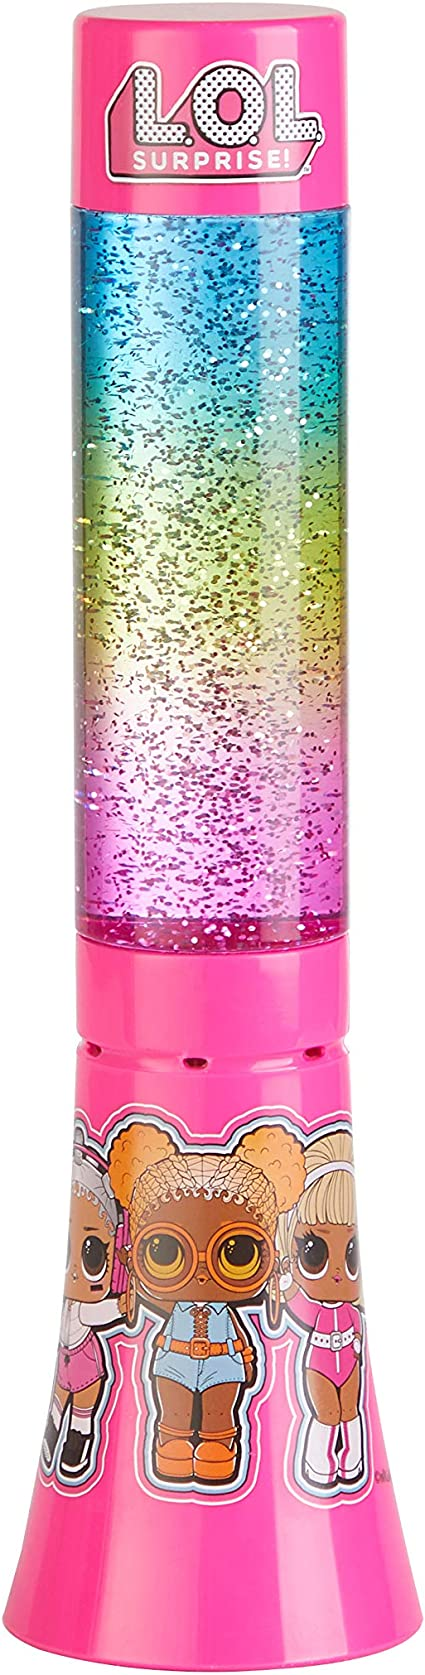 LOL Surprise Glitter Volcano Lamp